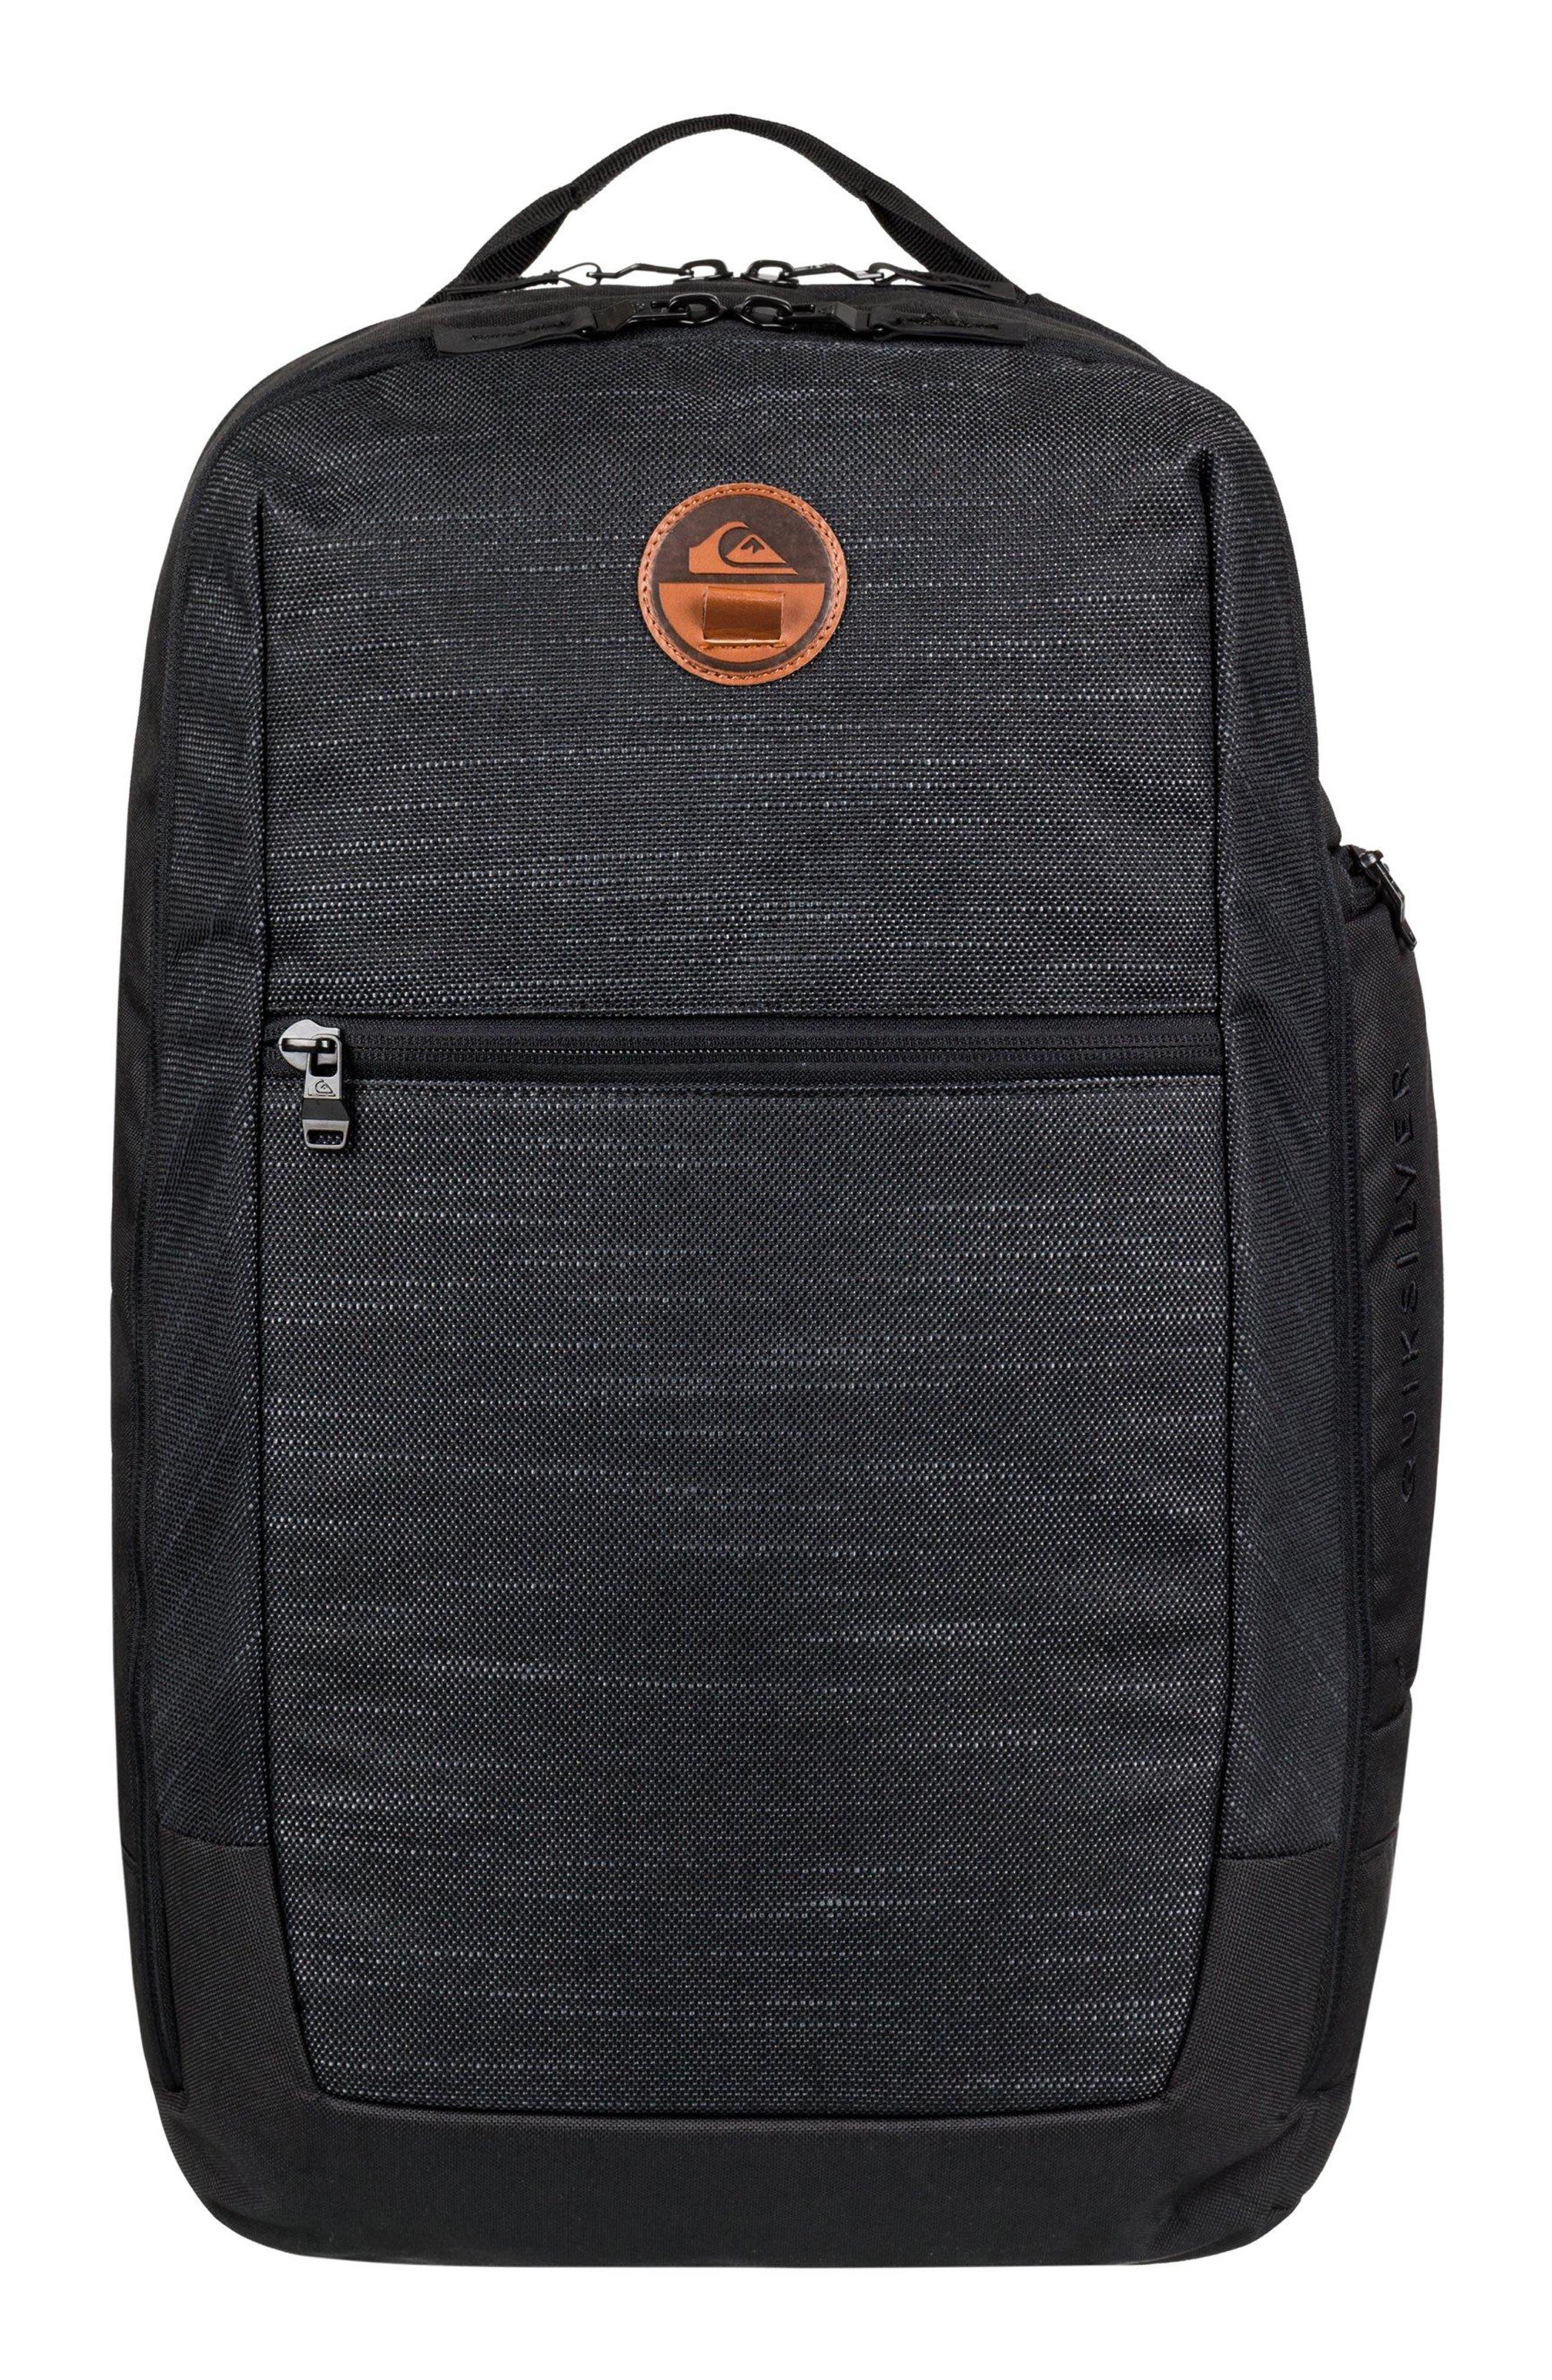 Quiksilver 25L Upshot Plus Backpack - Black